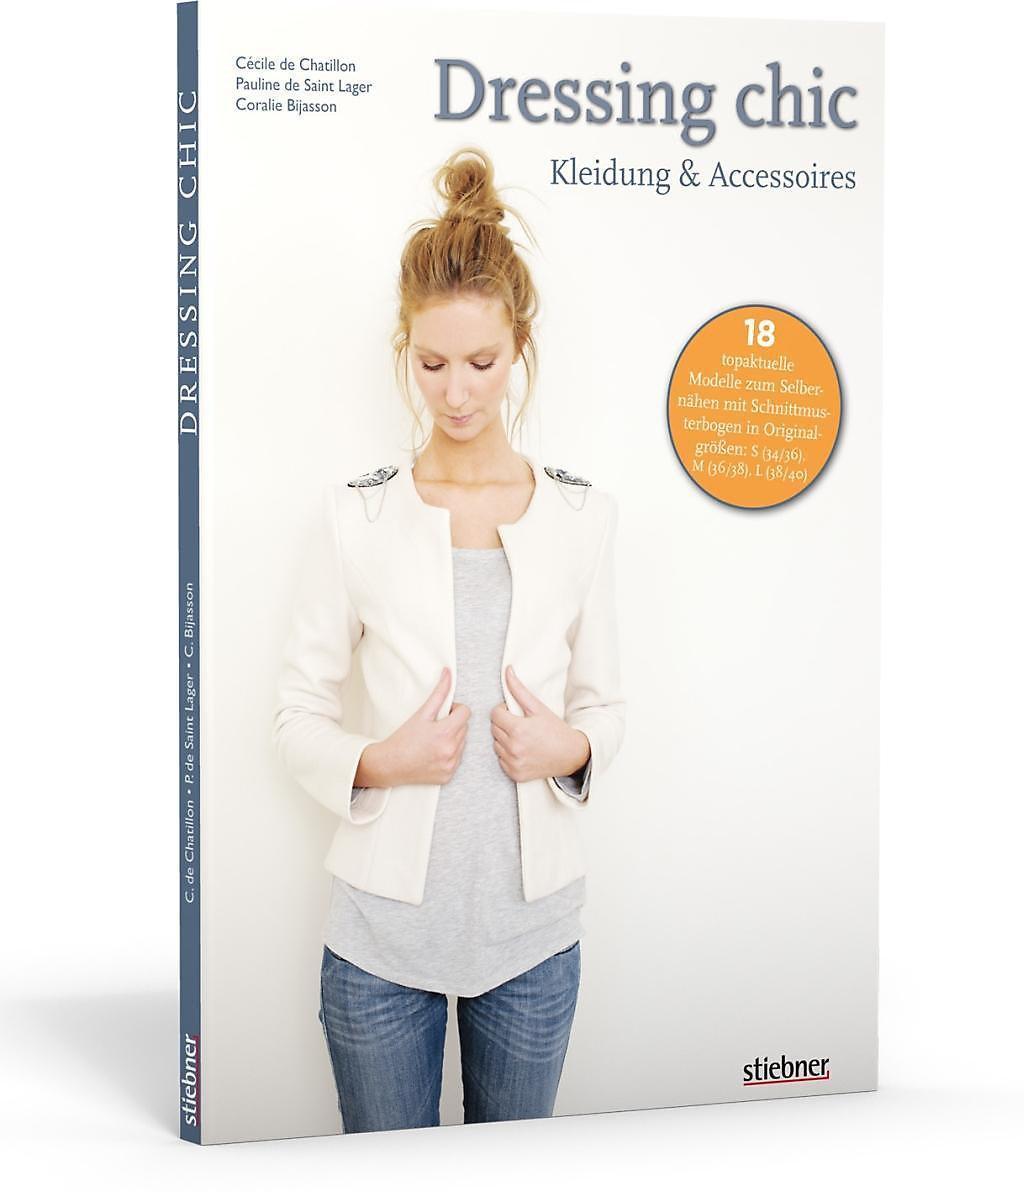 on sale 14eb6 2f583 Dressing chic - Kleidung & Accessoires Buch portofrei ...